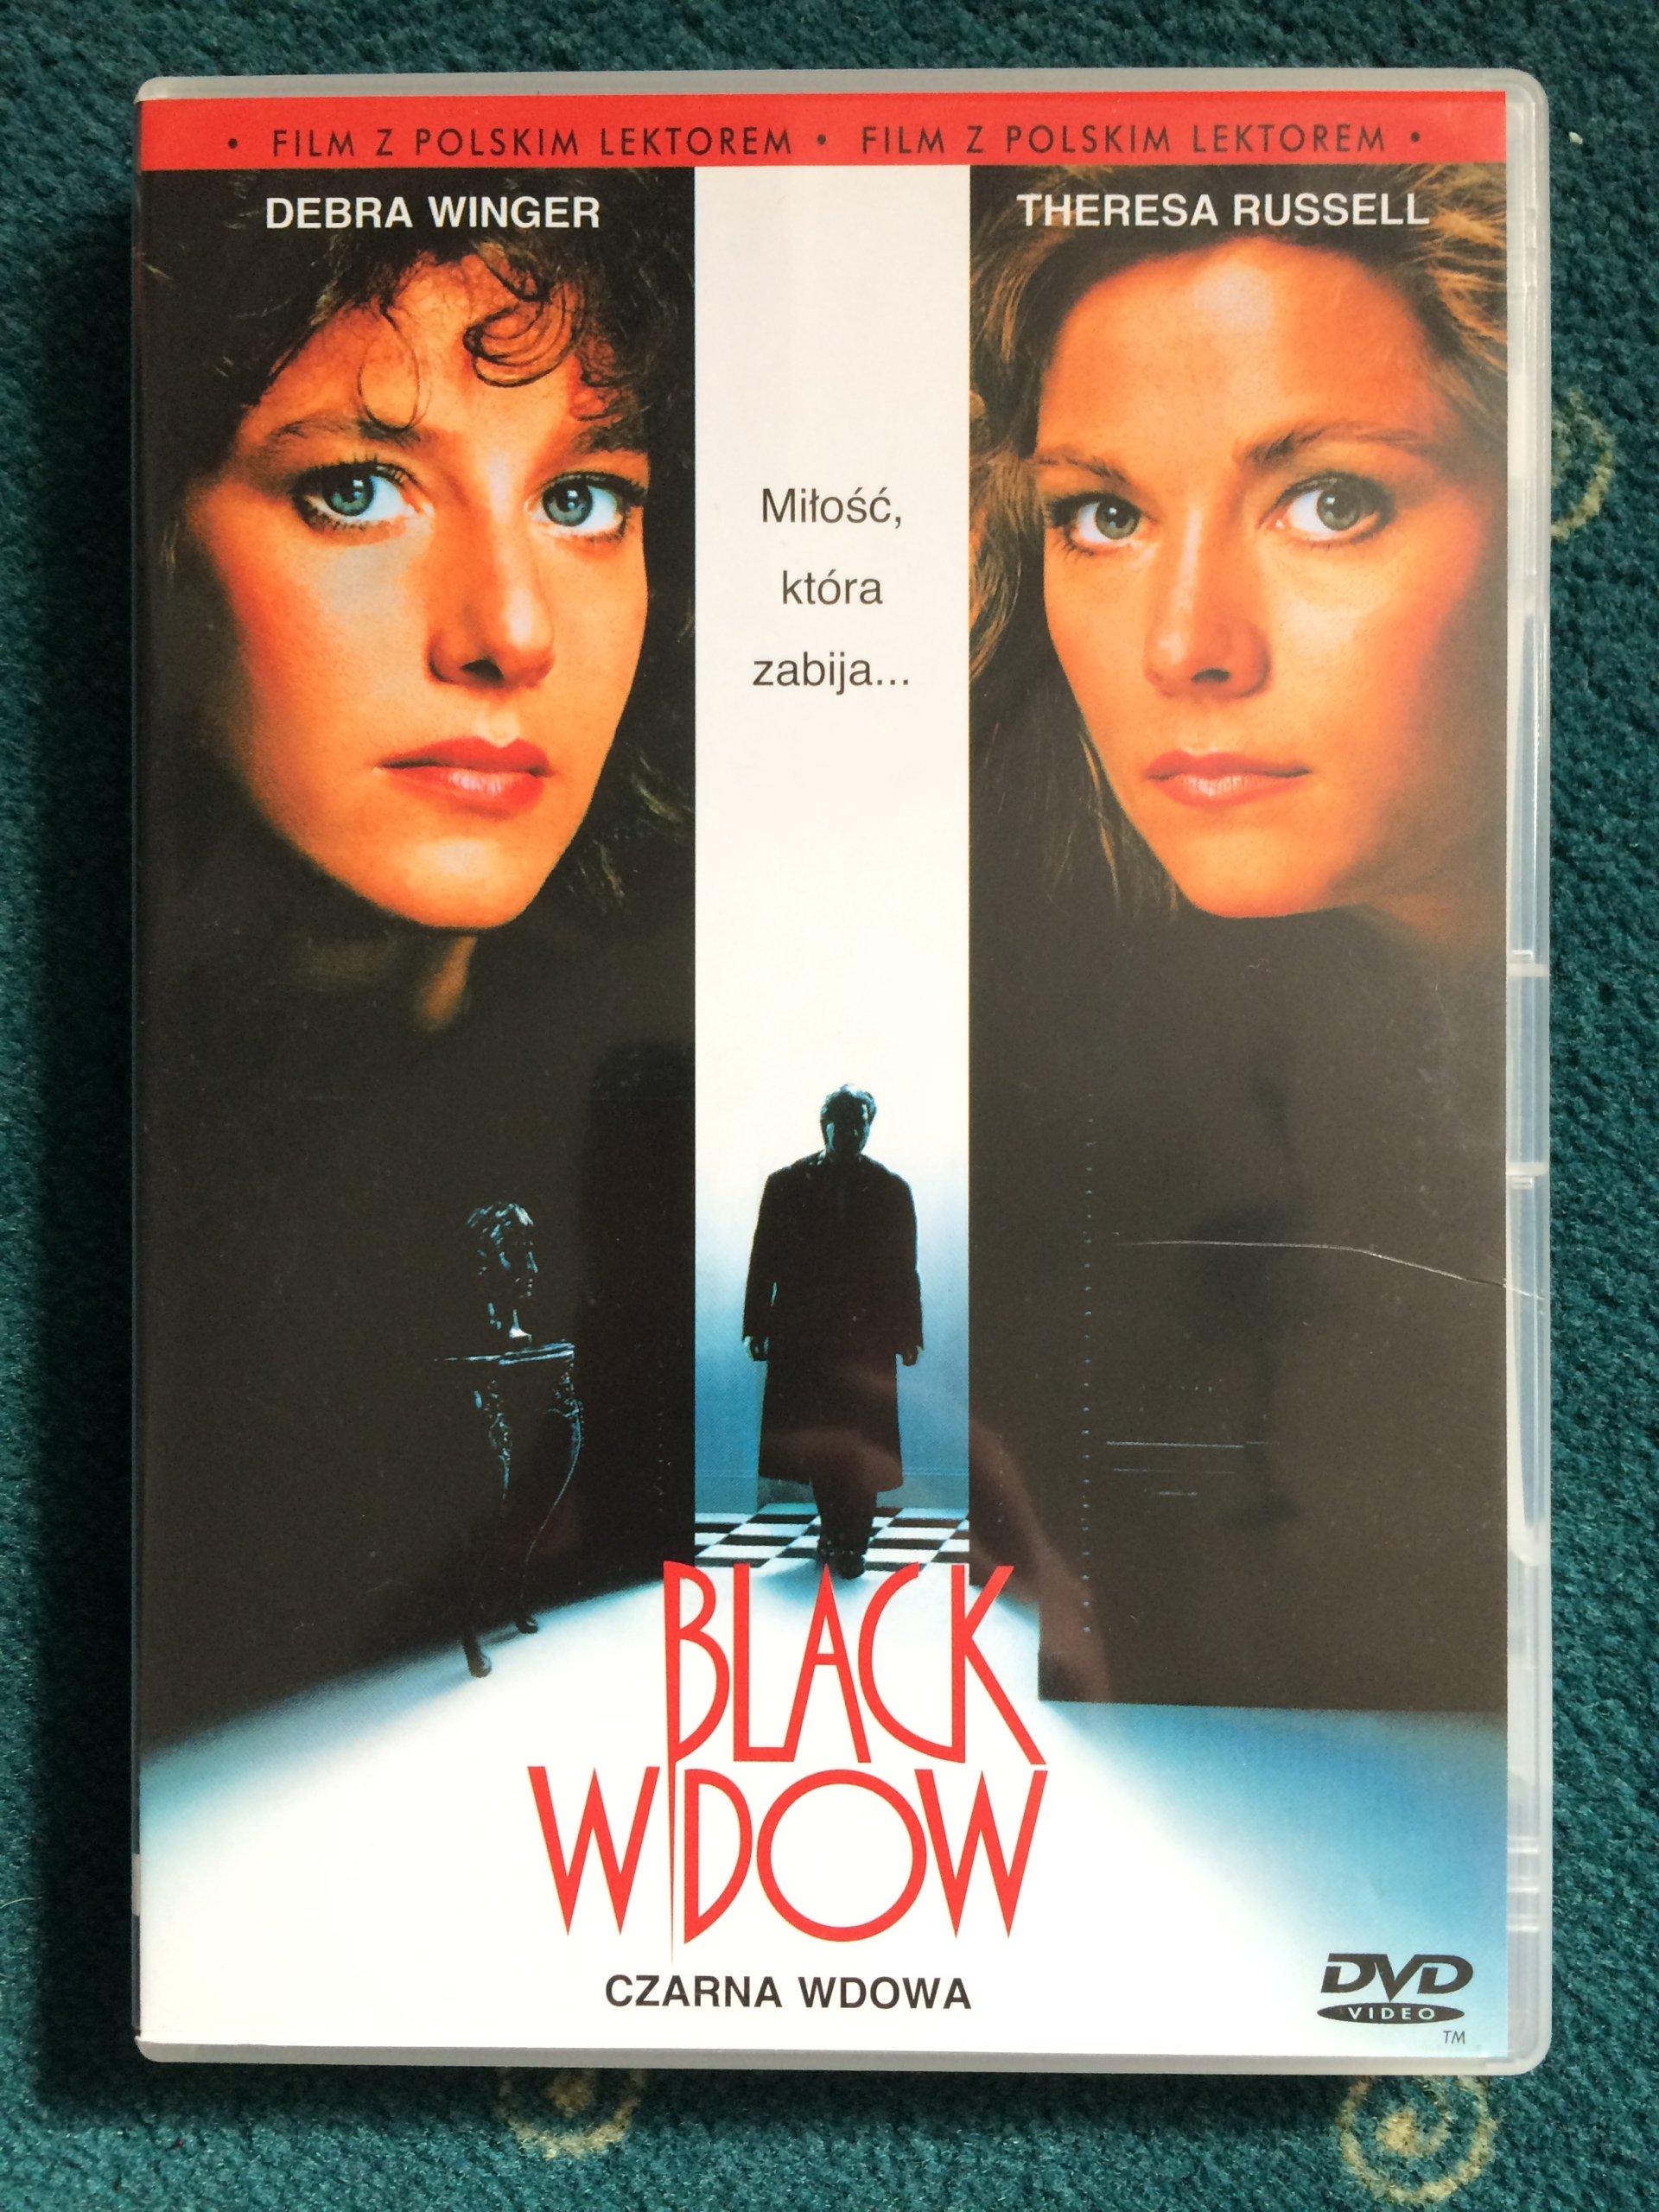 Filmy z czarnej orgii